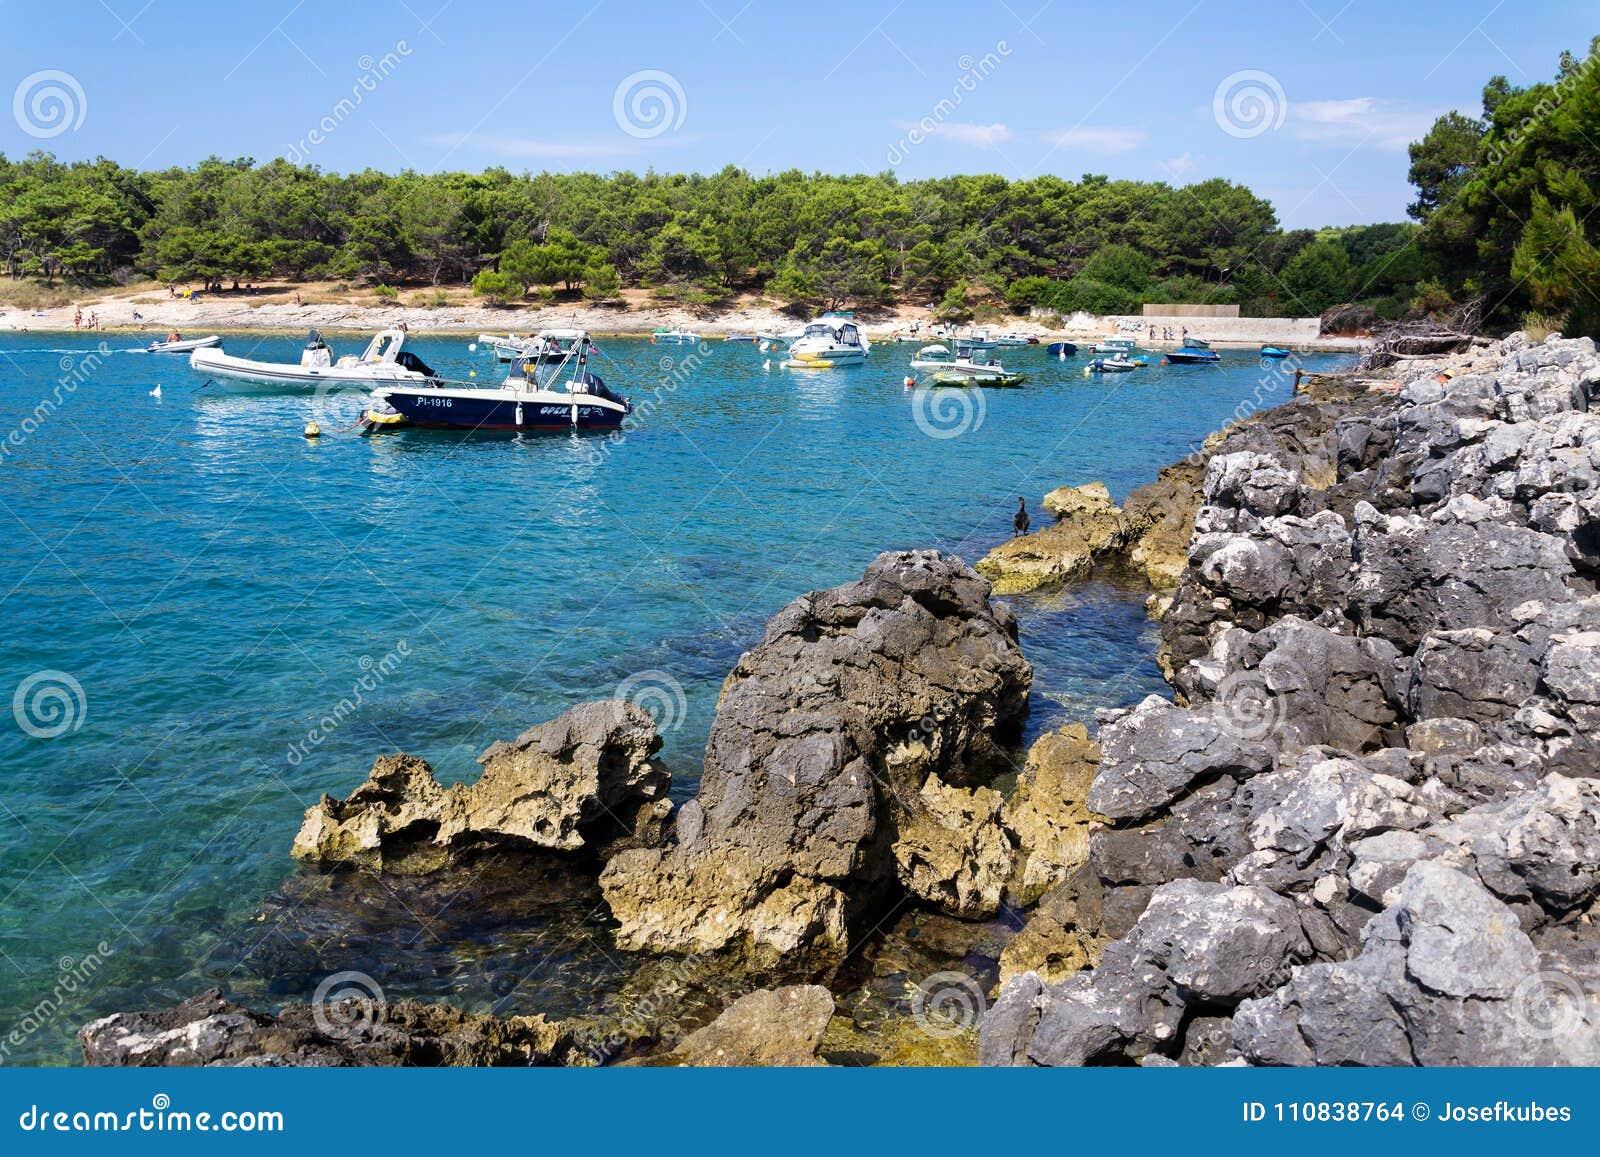 Boats on Kamenjak peninsula by the Adriatic Sea in Premantura, Croatia.